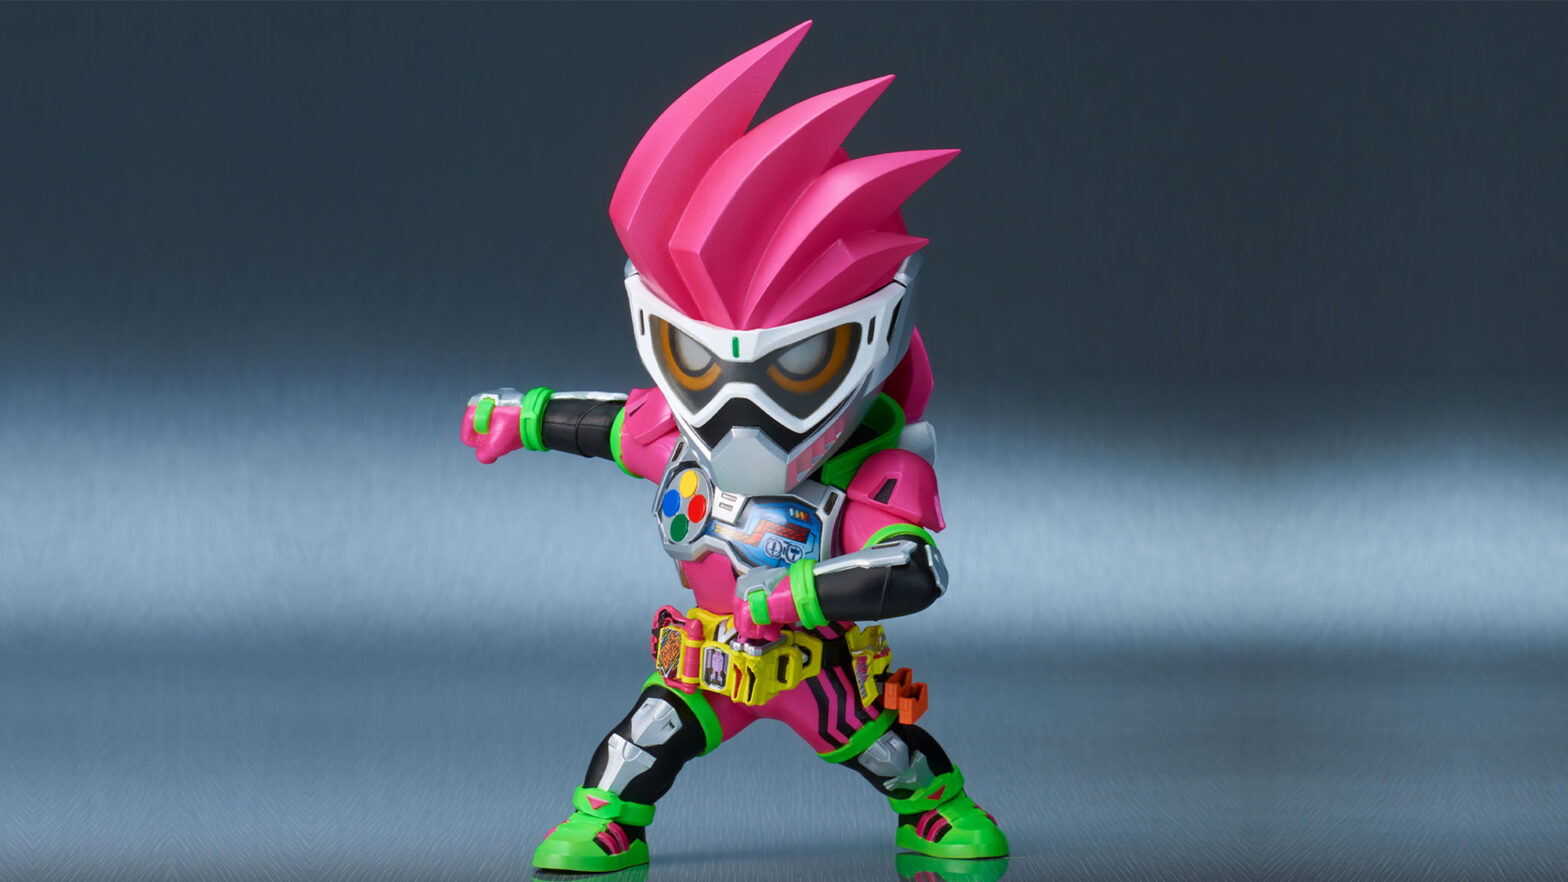 Shonen-Ric Deforial Kamen Rider Ex-Aid Action Gamer Figure